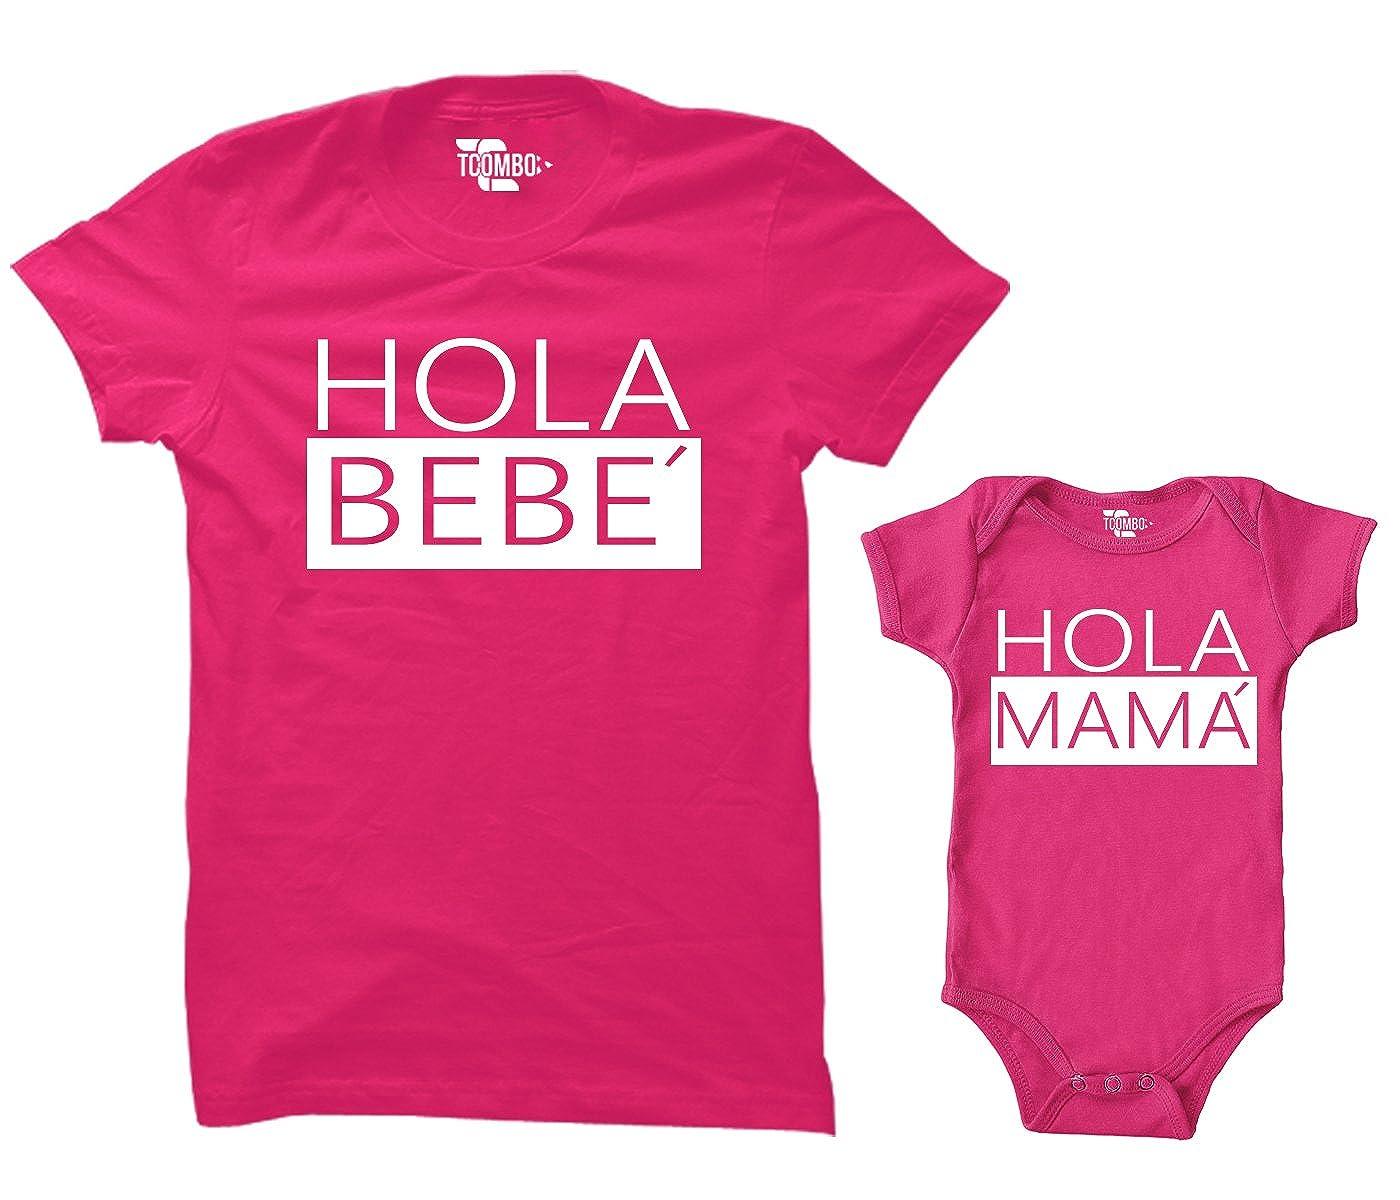 Amazon.com: tcombo Hola Bebe/Hola Mama Juego de Body y ...